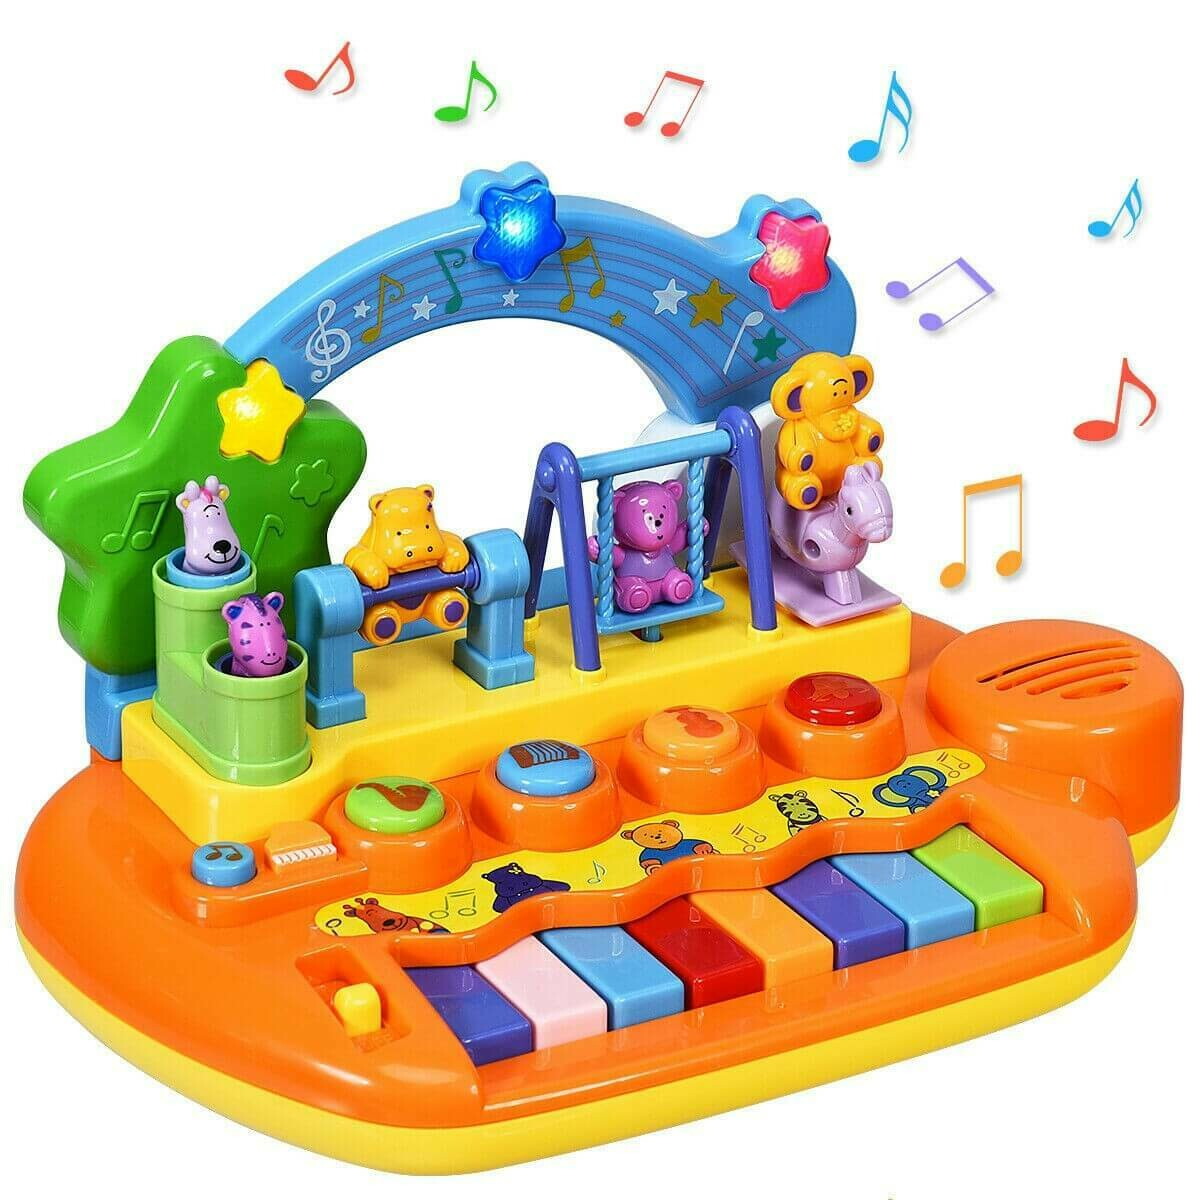 Kids Rainbow Piano Keyboard with Animal Playground LED Light 8 Keys